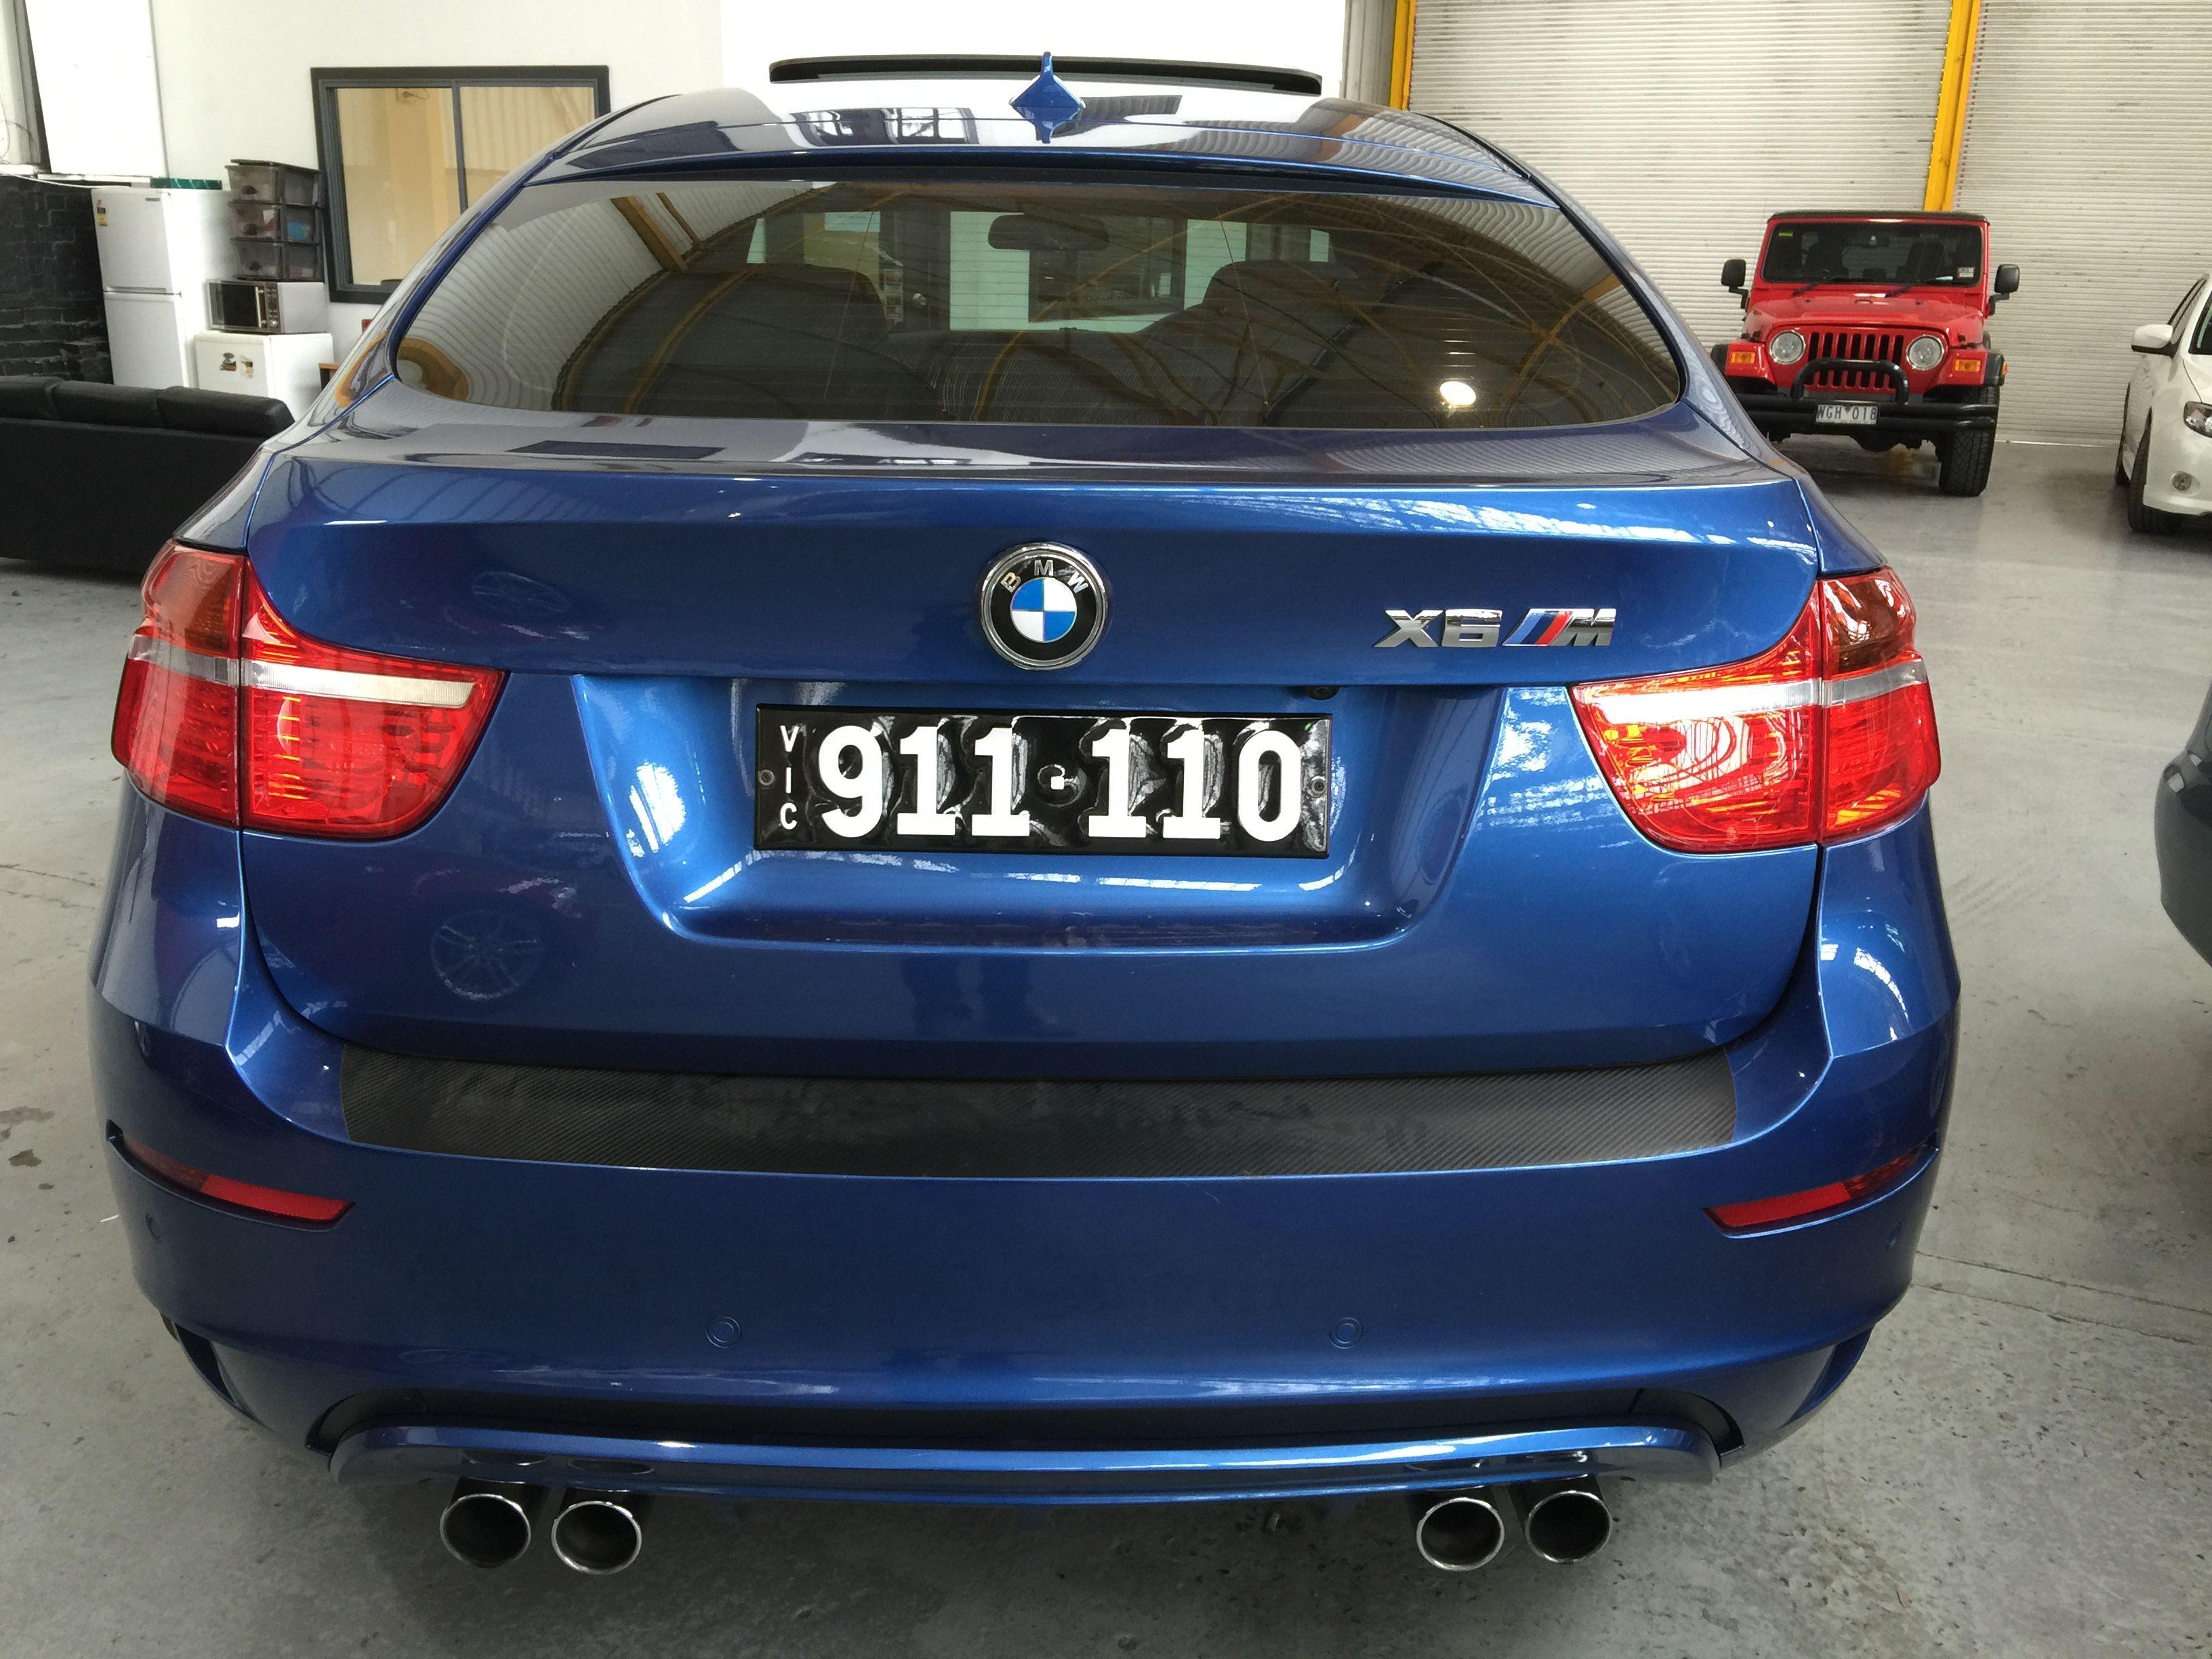 My New Toy Blue Bmw X6m X6 M Carbon Whataf Machine Black Wheels